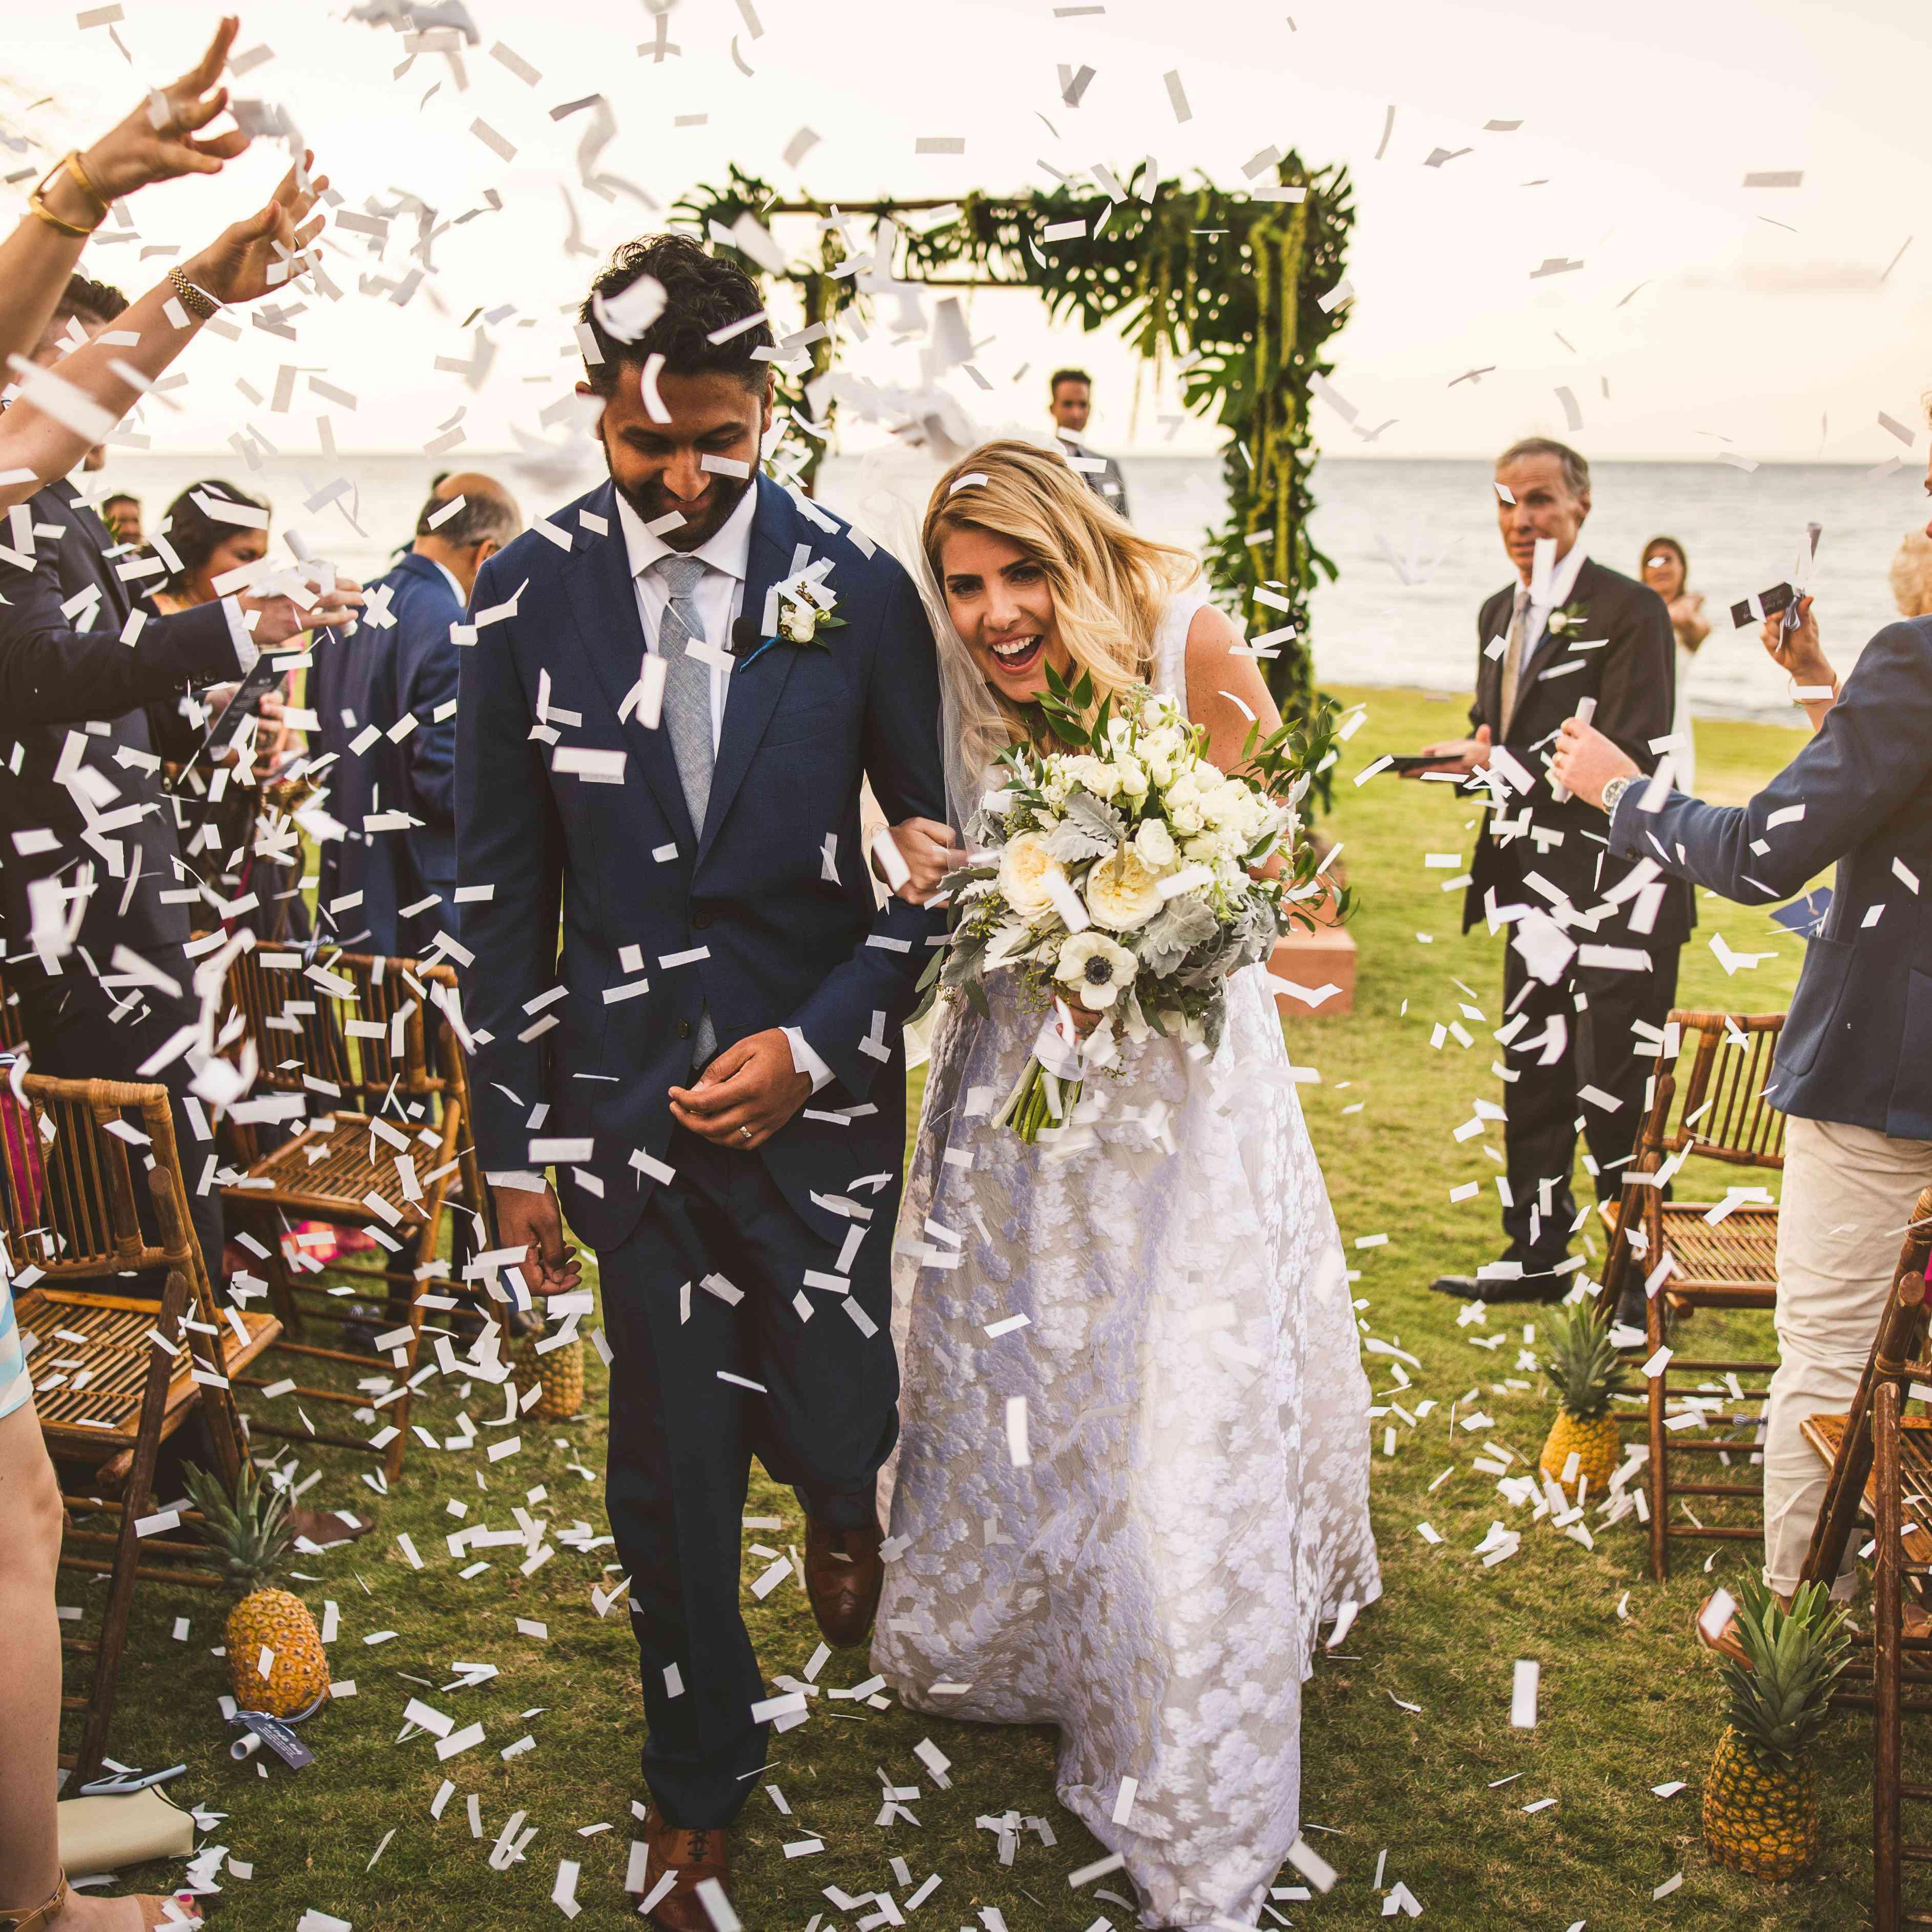 Funny Wedding Ideas For Reception: 25 Wedding Sendoff Ideas For Making An Unforgettable Exit